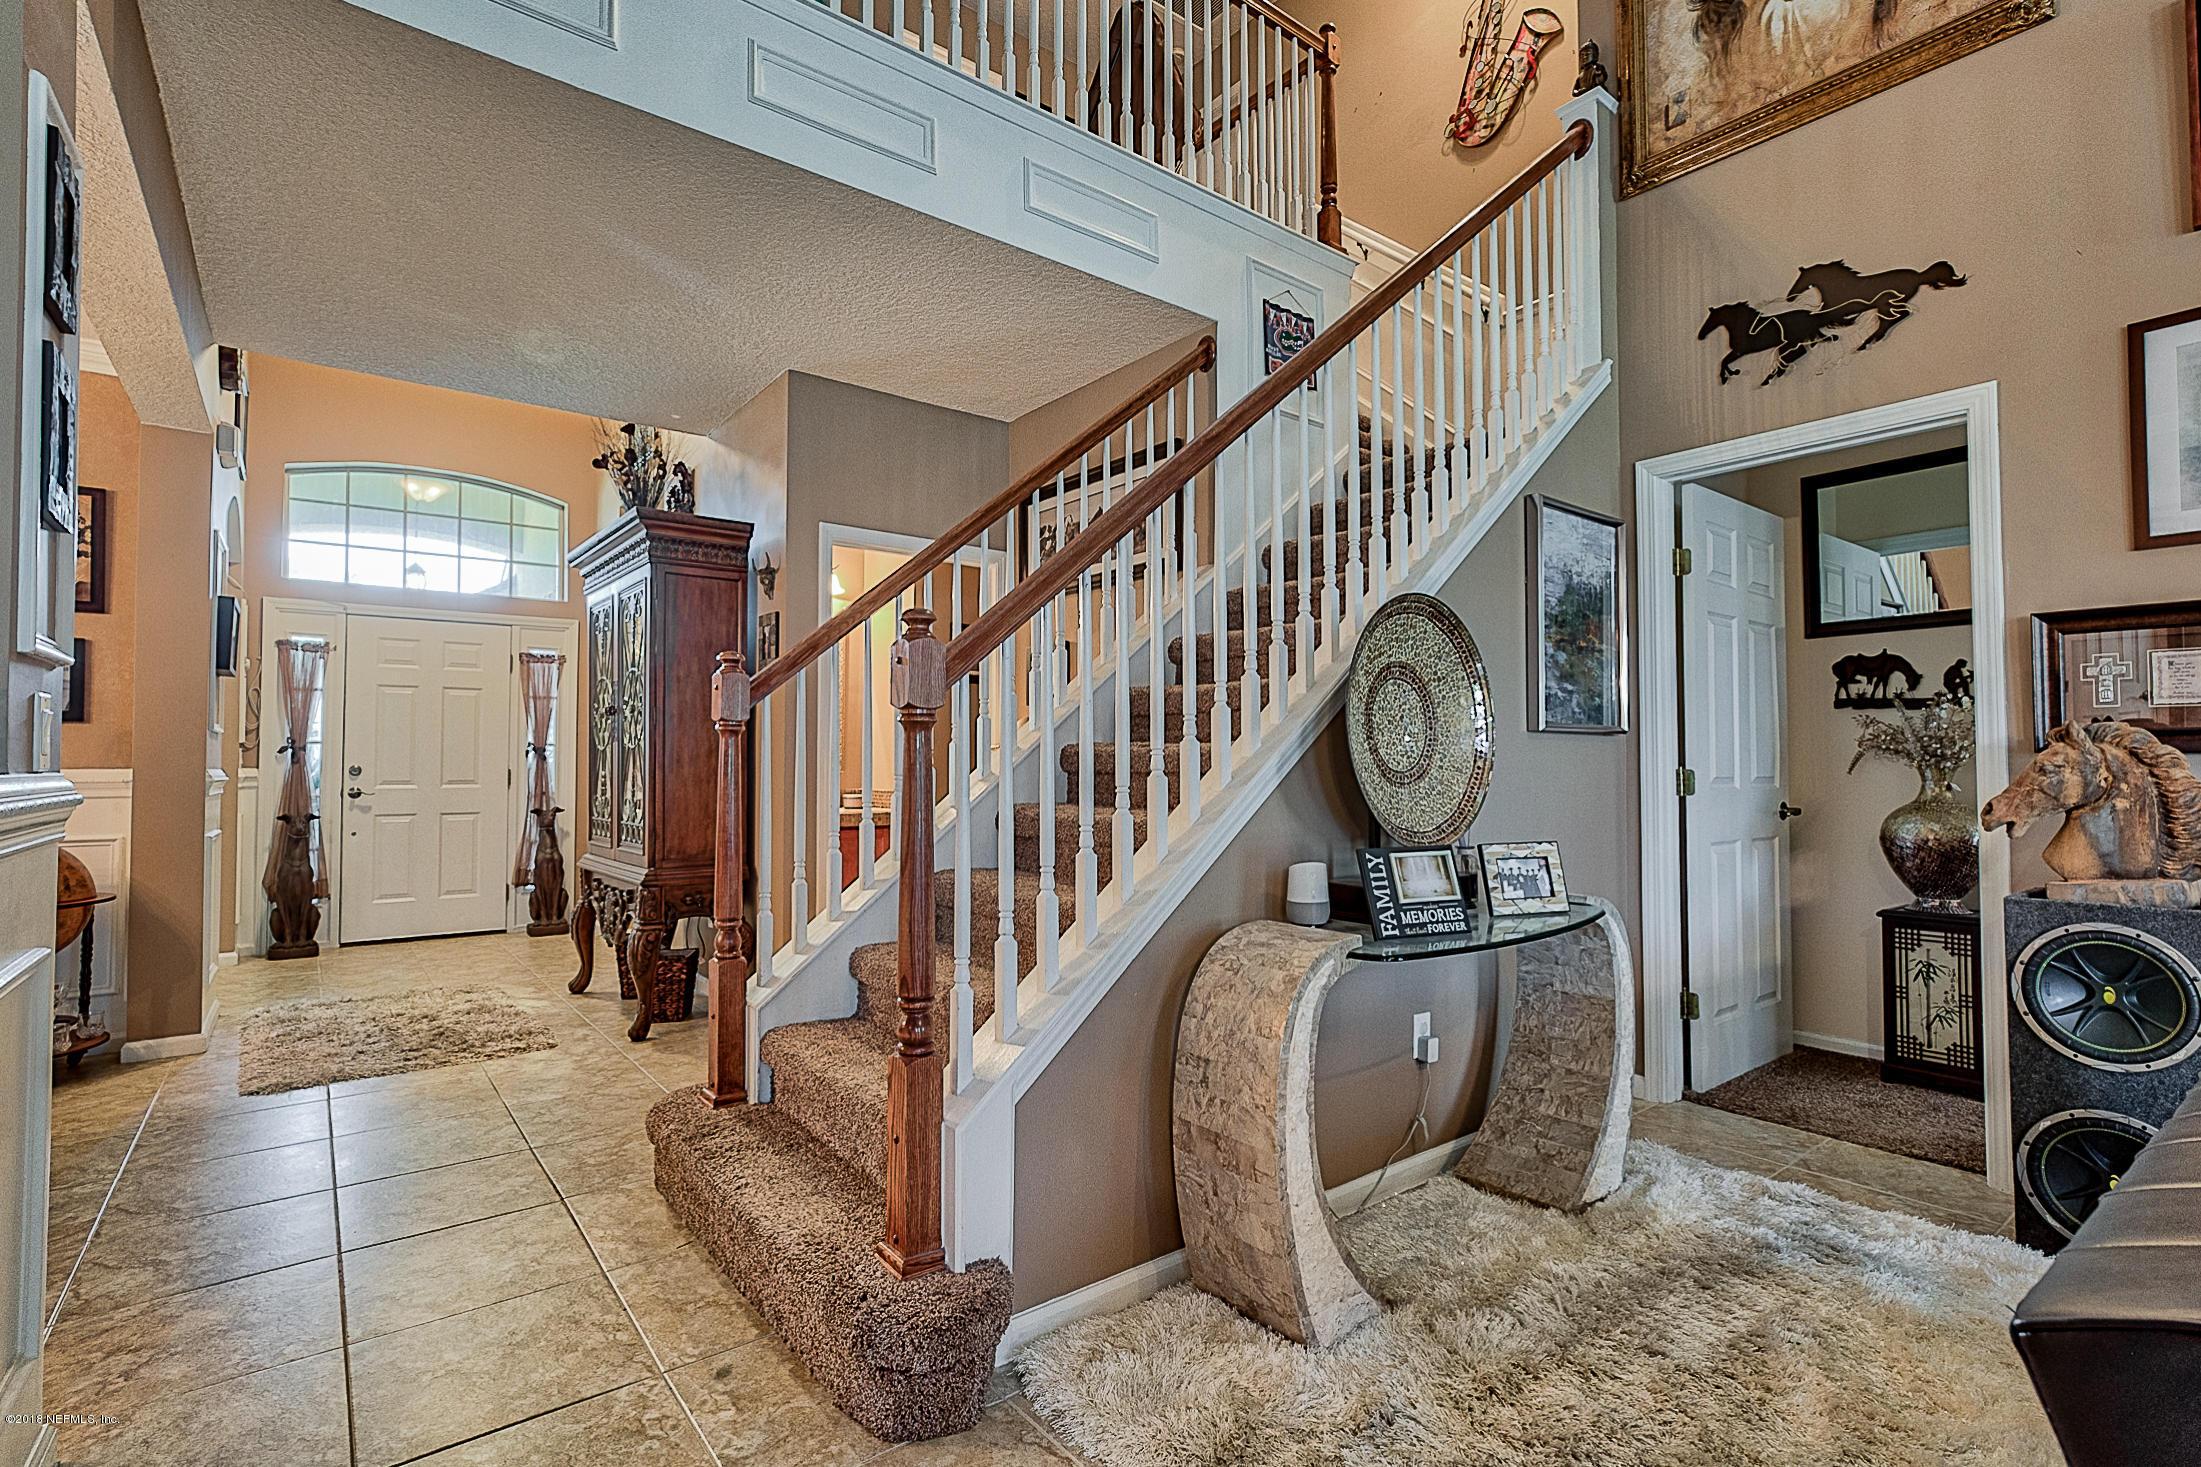 964 STEEPLECHASE, ORANGE PARK, FLORIDA 32065, 4 Bedrooms Bedrooms, ,2 BathroomsBathrooms,Residential - single family,For sale,STEEPLECHASE,959728